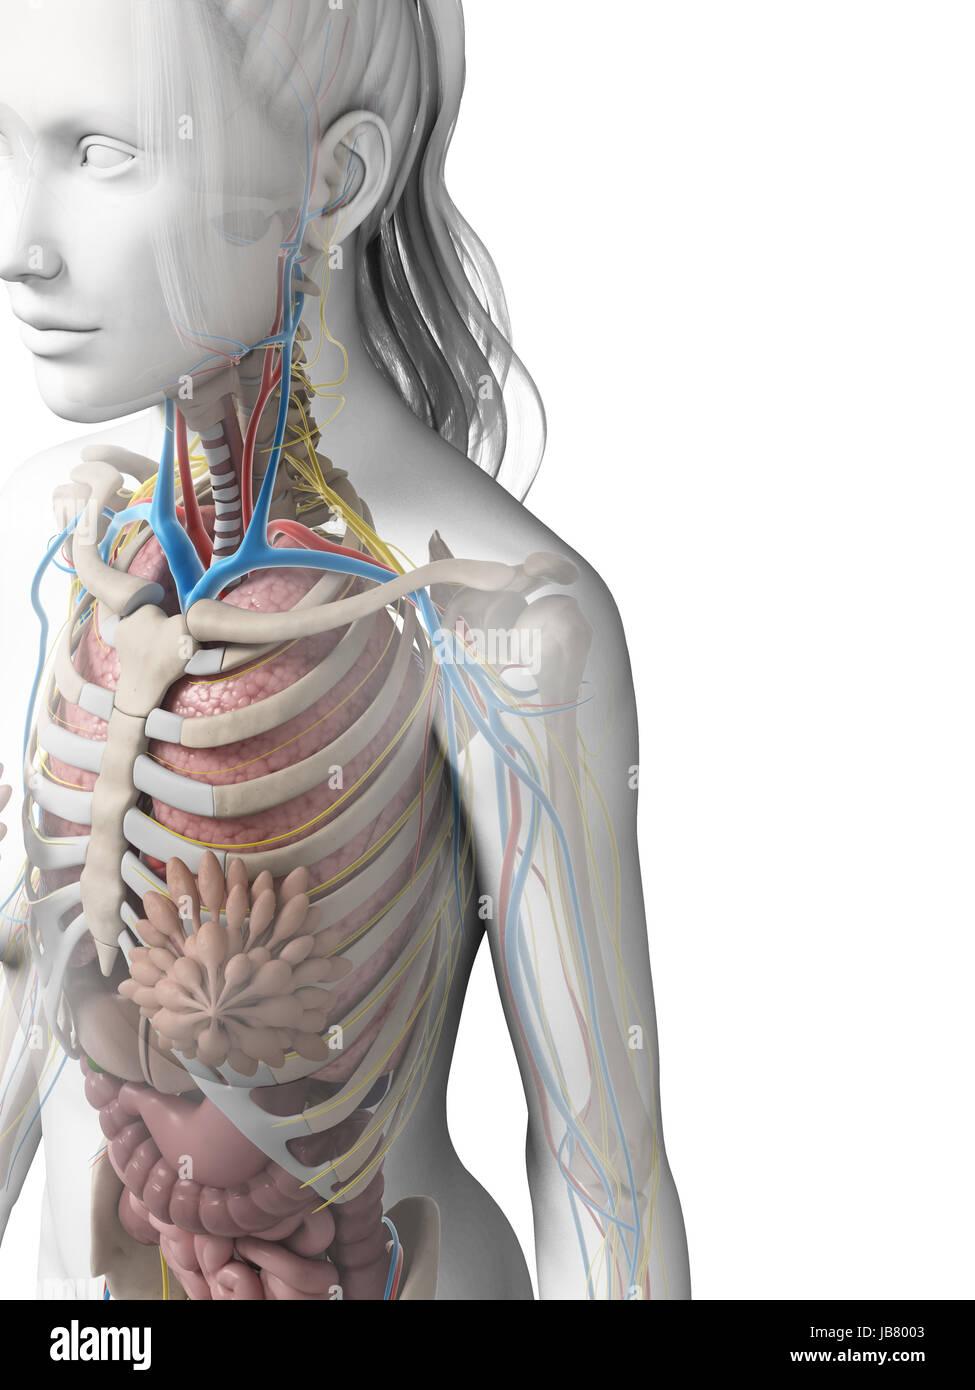 Anatomy Diagram Lungs Stockfotos & Anatomy Diagram Lungs Bilder ...